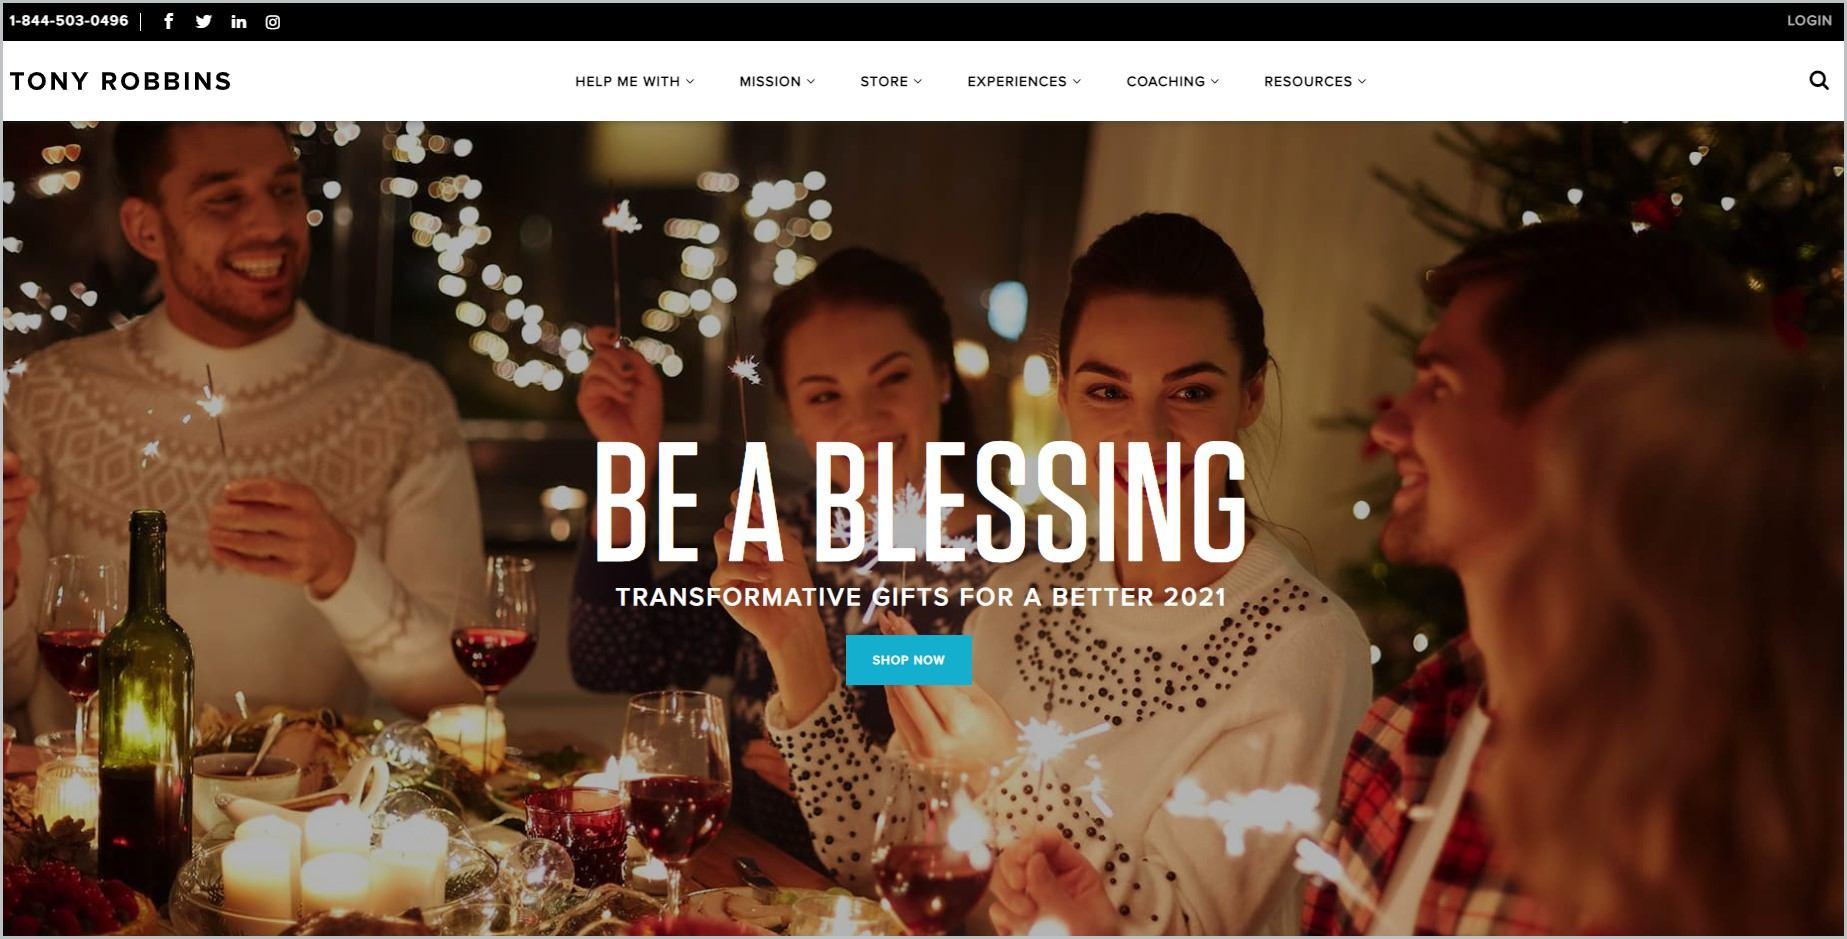 screenshot of Tony Robbins homepage